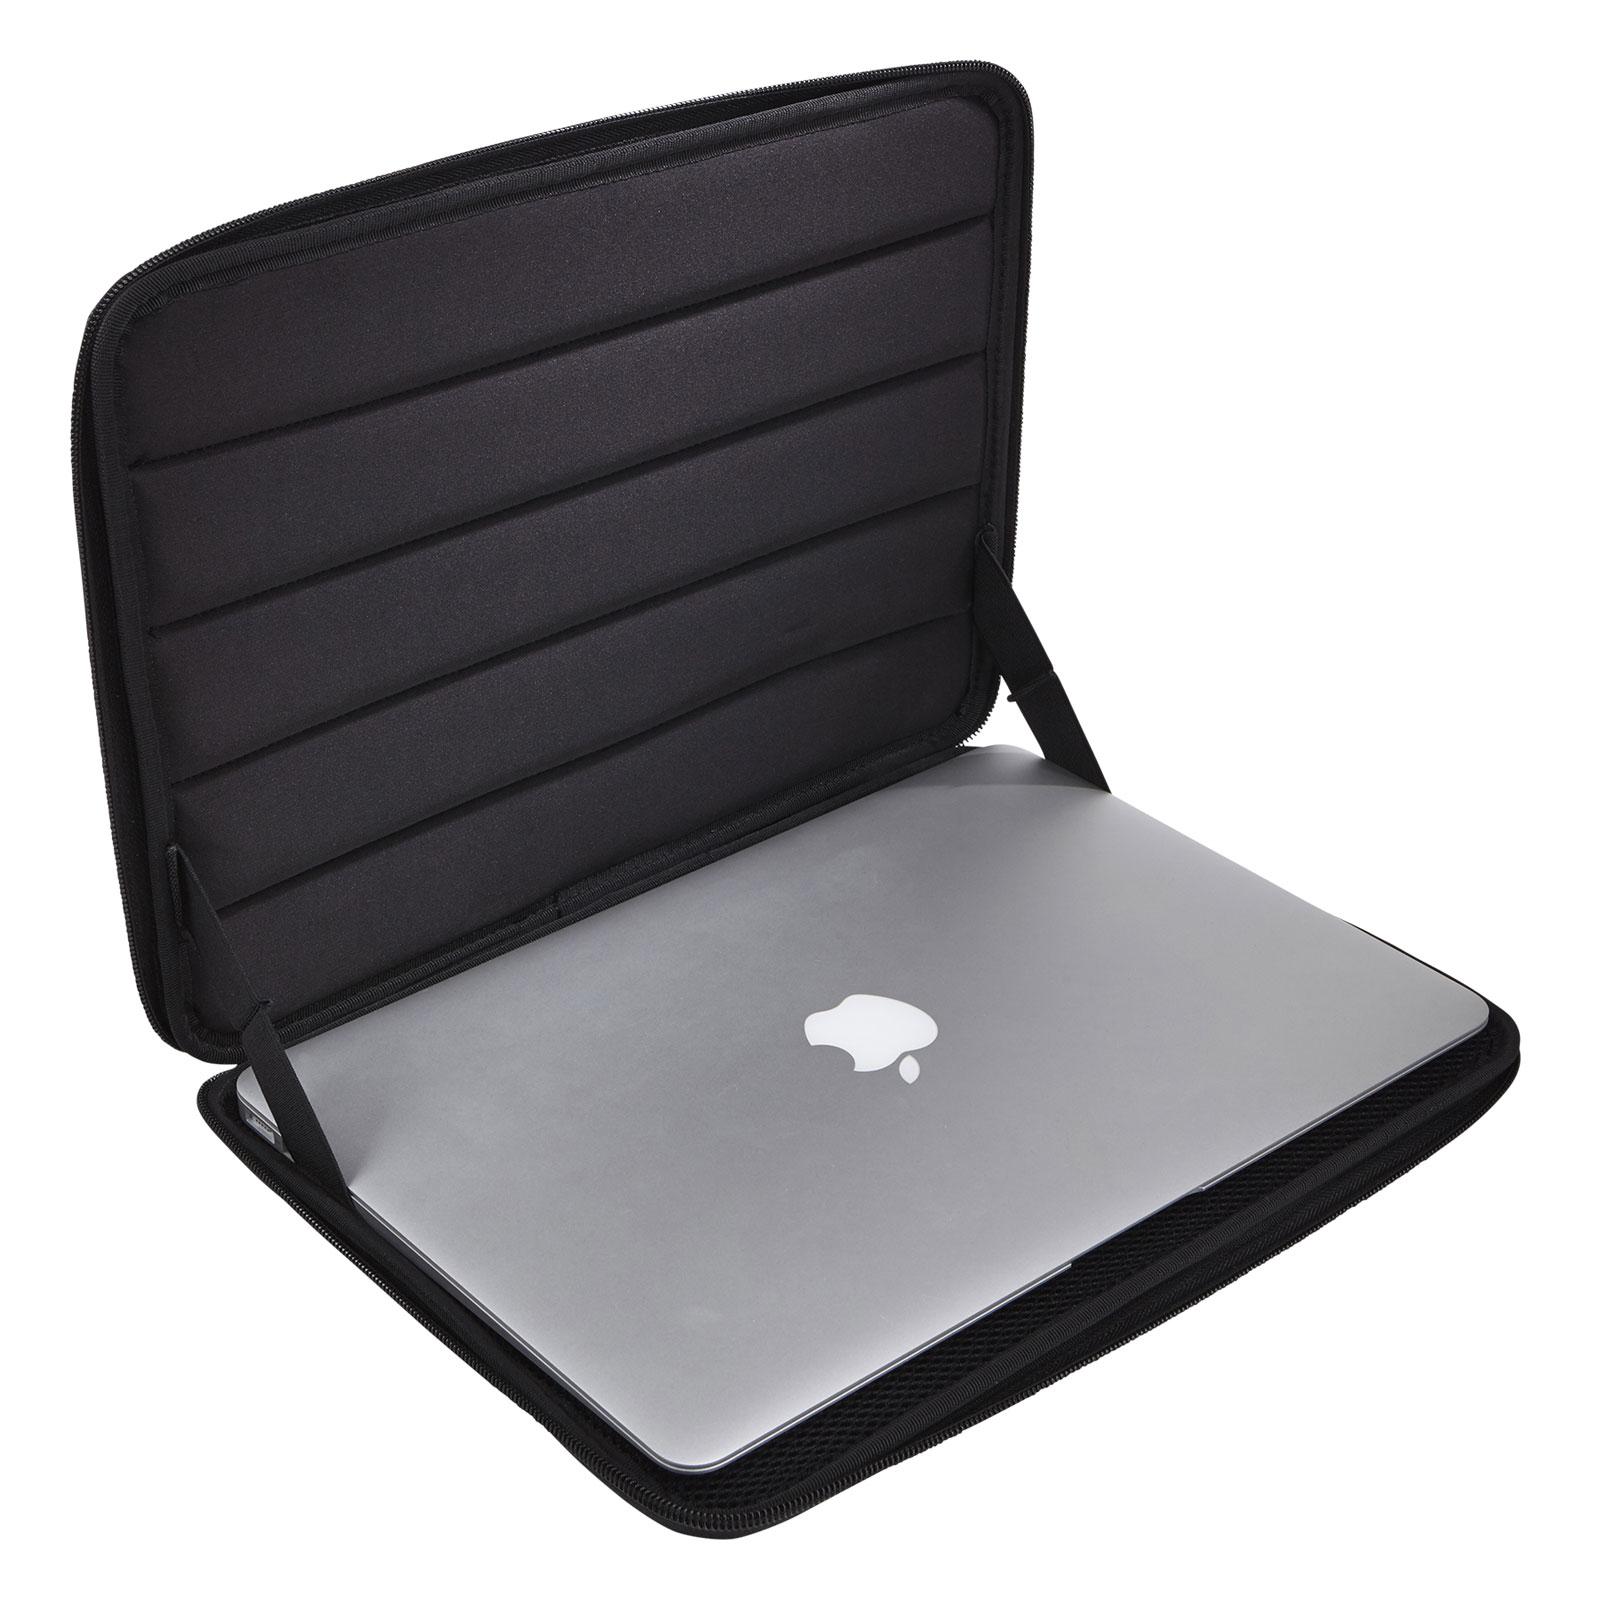 case logic arca 13 3 39 39 casque offert sac sacoche. Black Bedroom Furniture Sets. Home Design Ideas